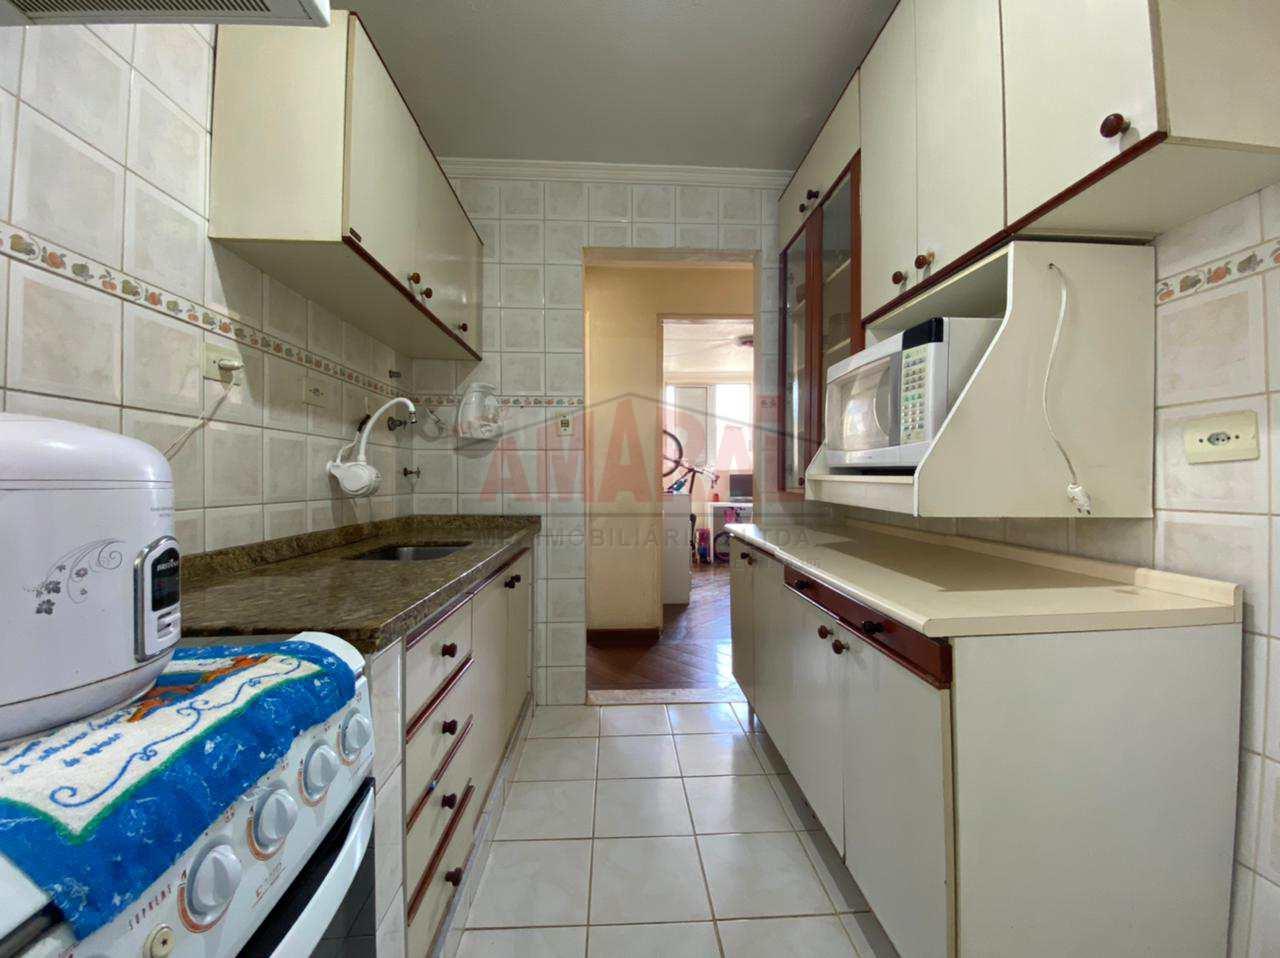 Apartamento com 2 dorms, Cidade Satélite Santa Bárbara, São Paulo - R$ 178 mil, Cod: 11401